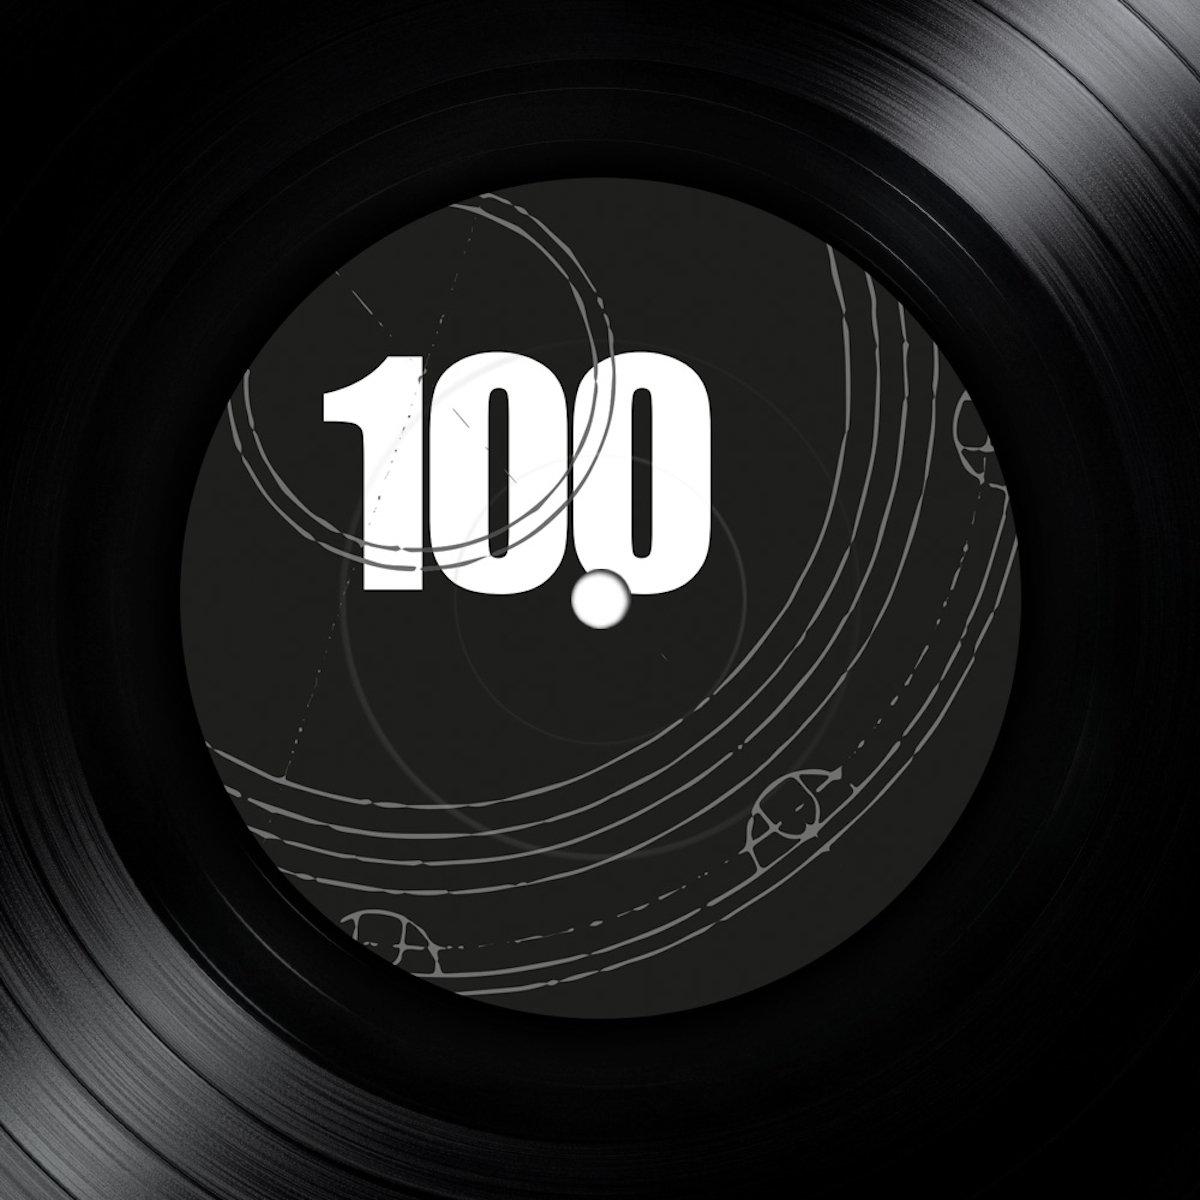 Dispatch 100 part 1 the future blueprint edition dispatch dis100 vinyl album 2 x 12 double pack 6 tracks brand new full artwork malvernweather Images